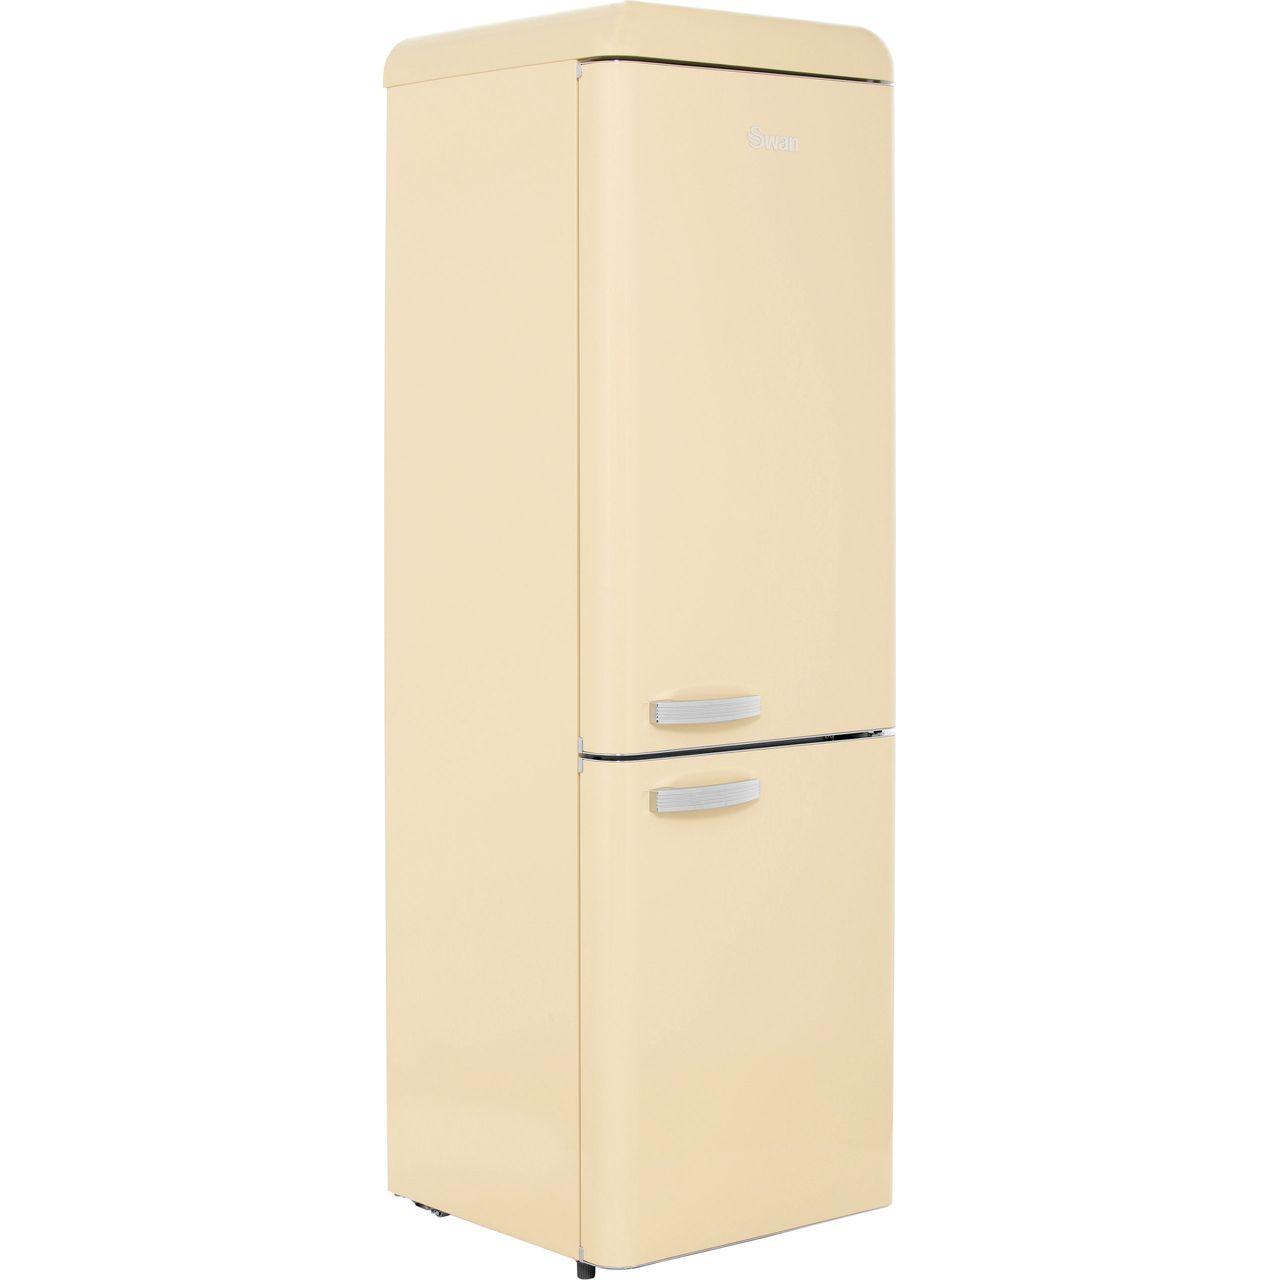 Swan Retro SR11020CN Free Standing Fridge Freezer in Cream